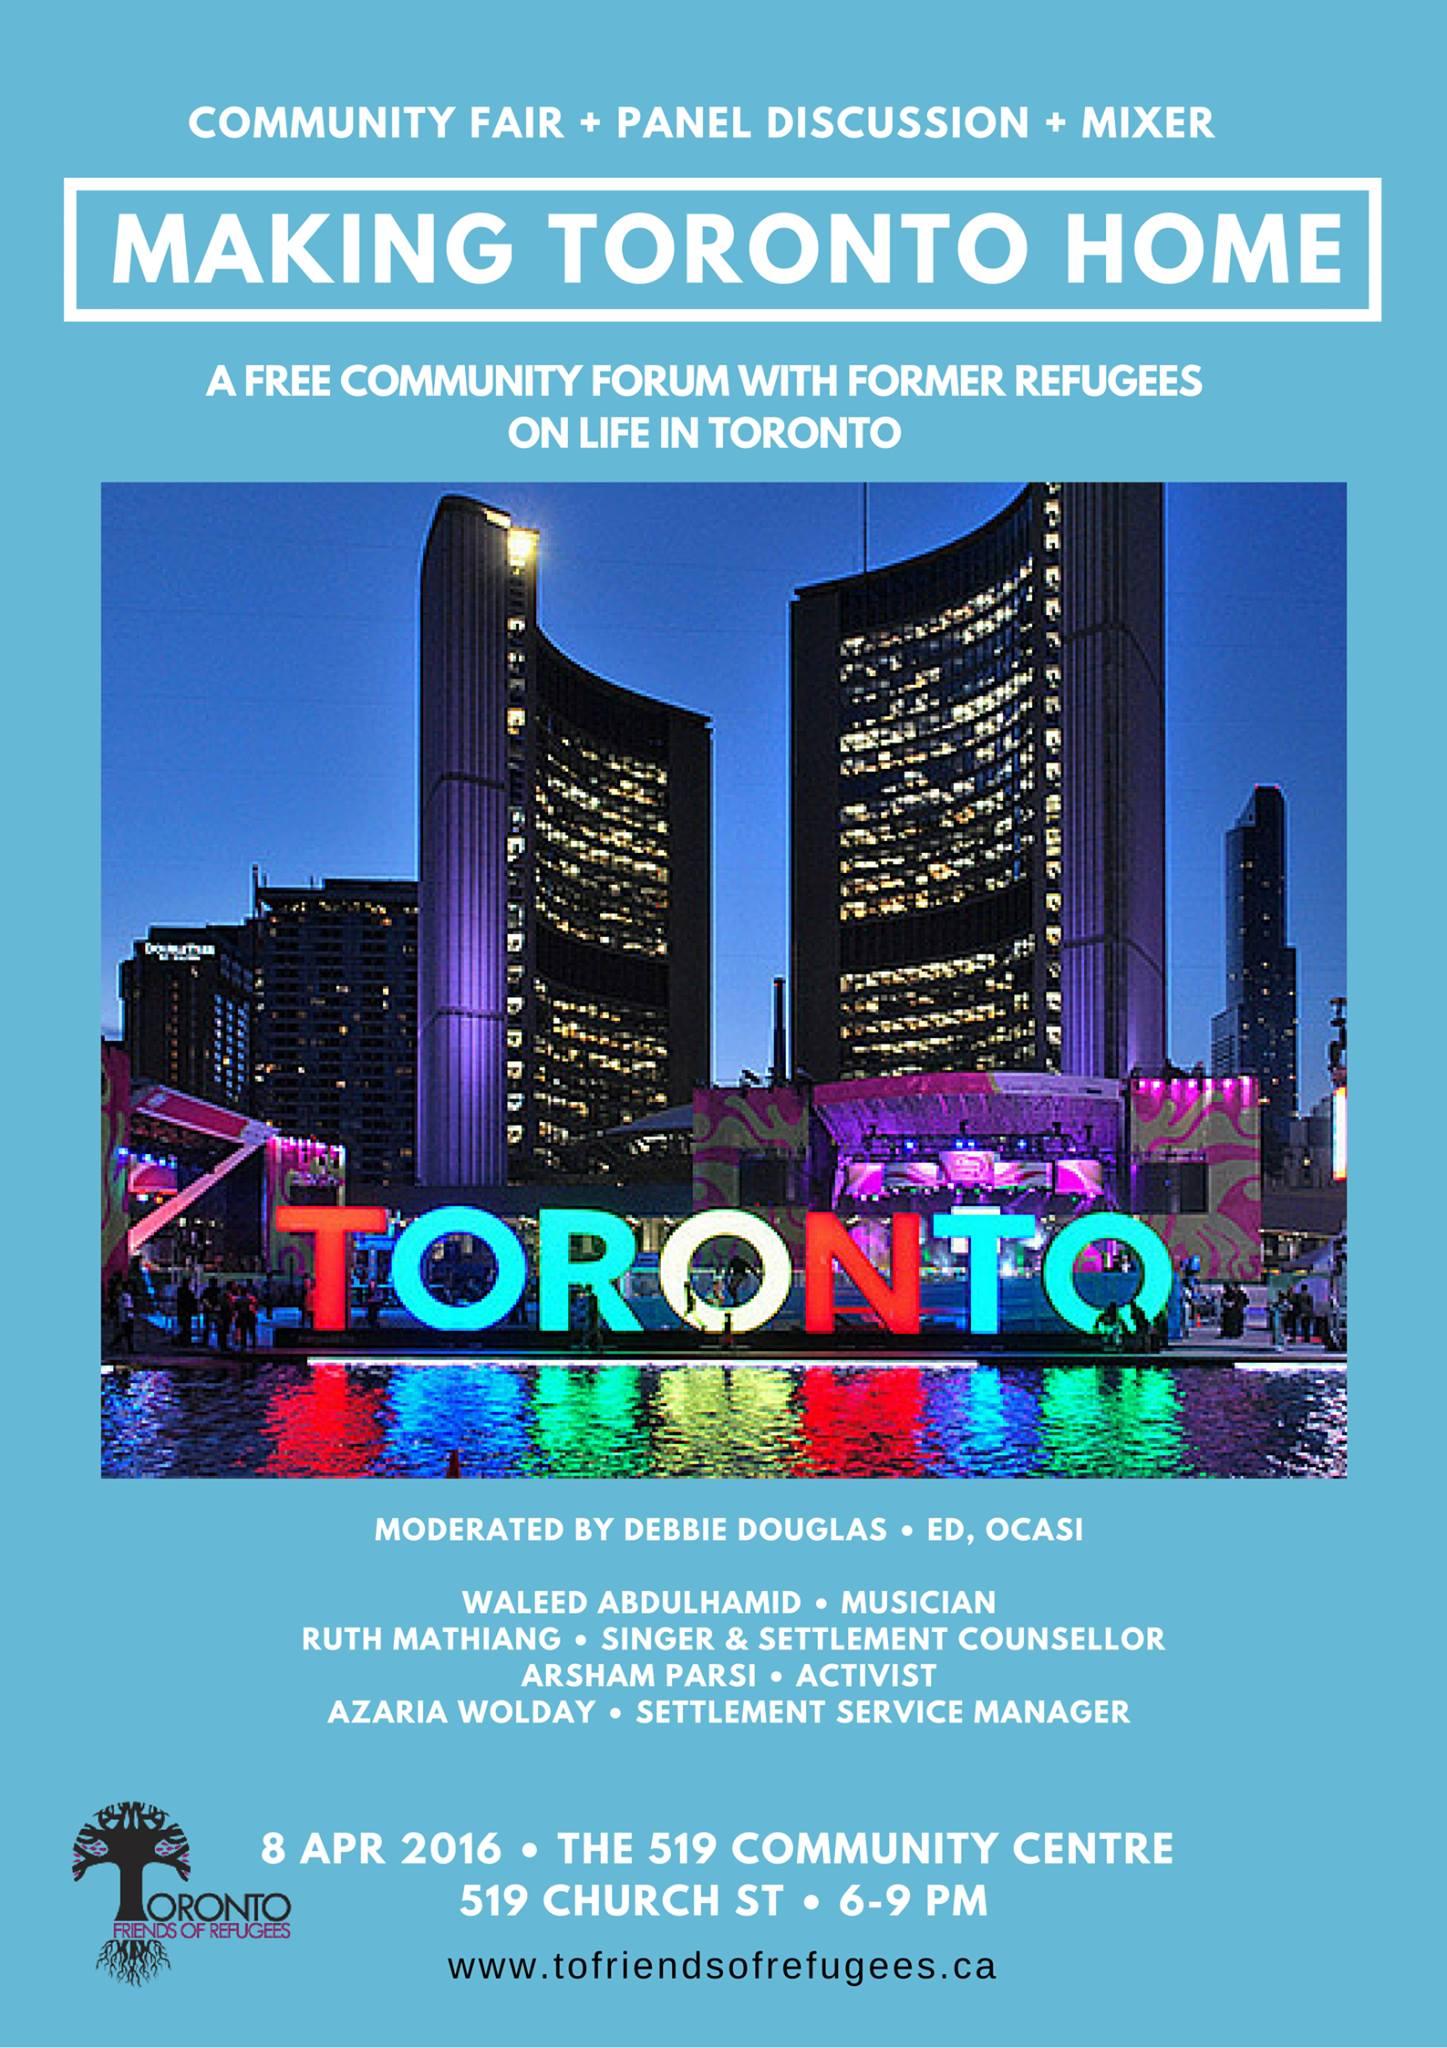 ocasi ontario council of agencies serving immigrants download flyer for more details